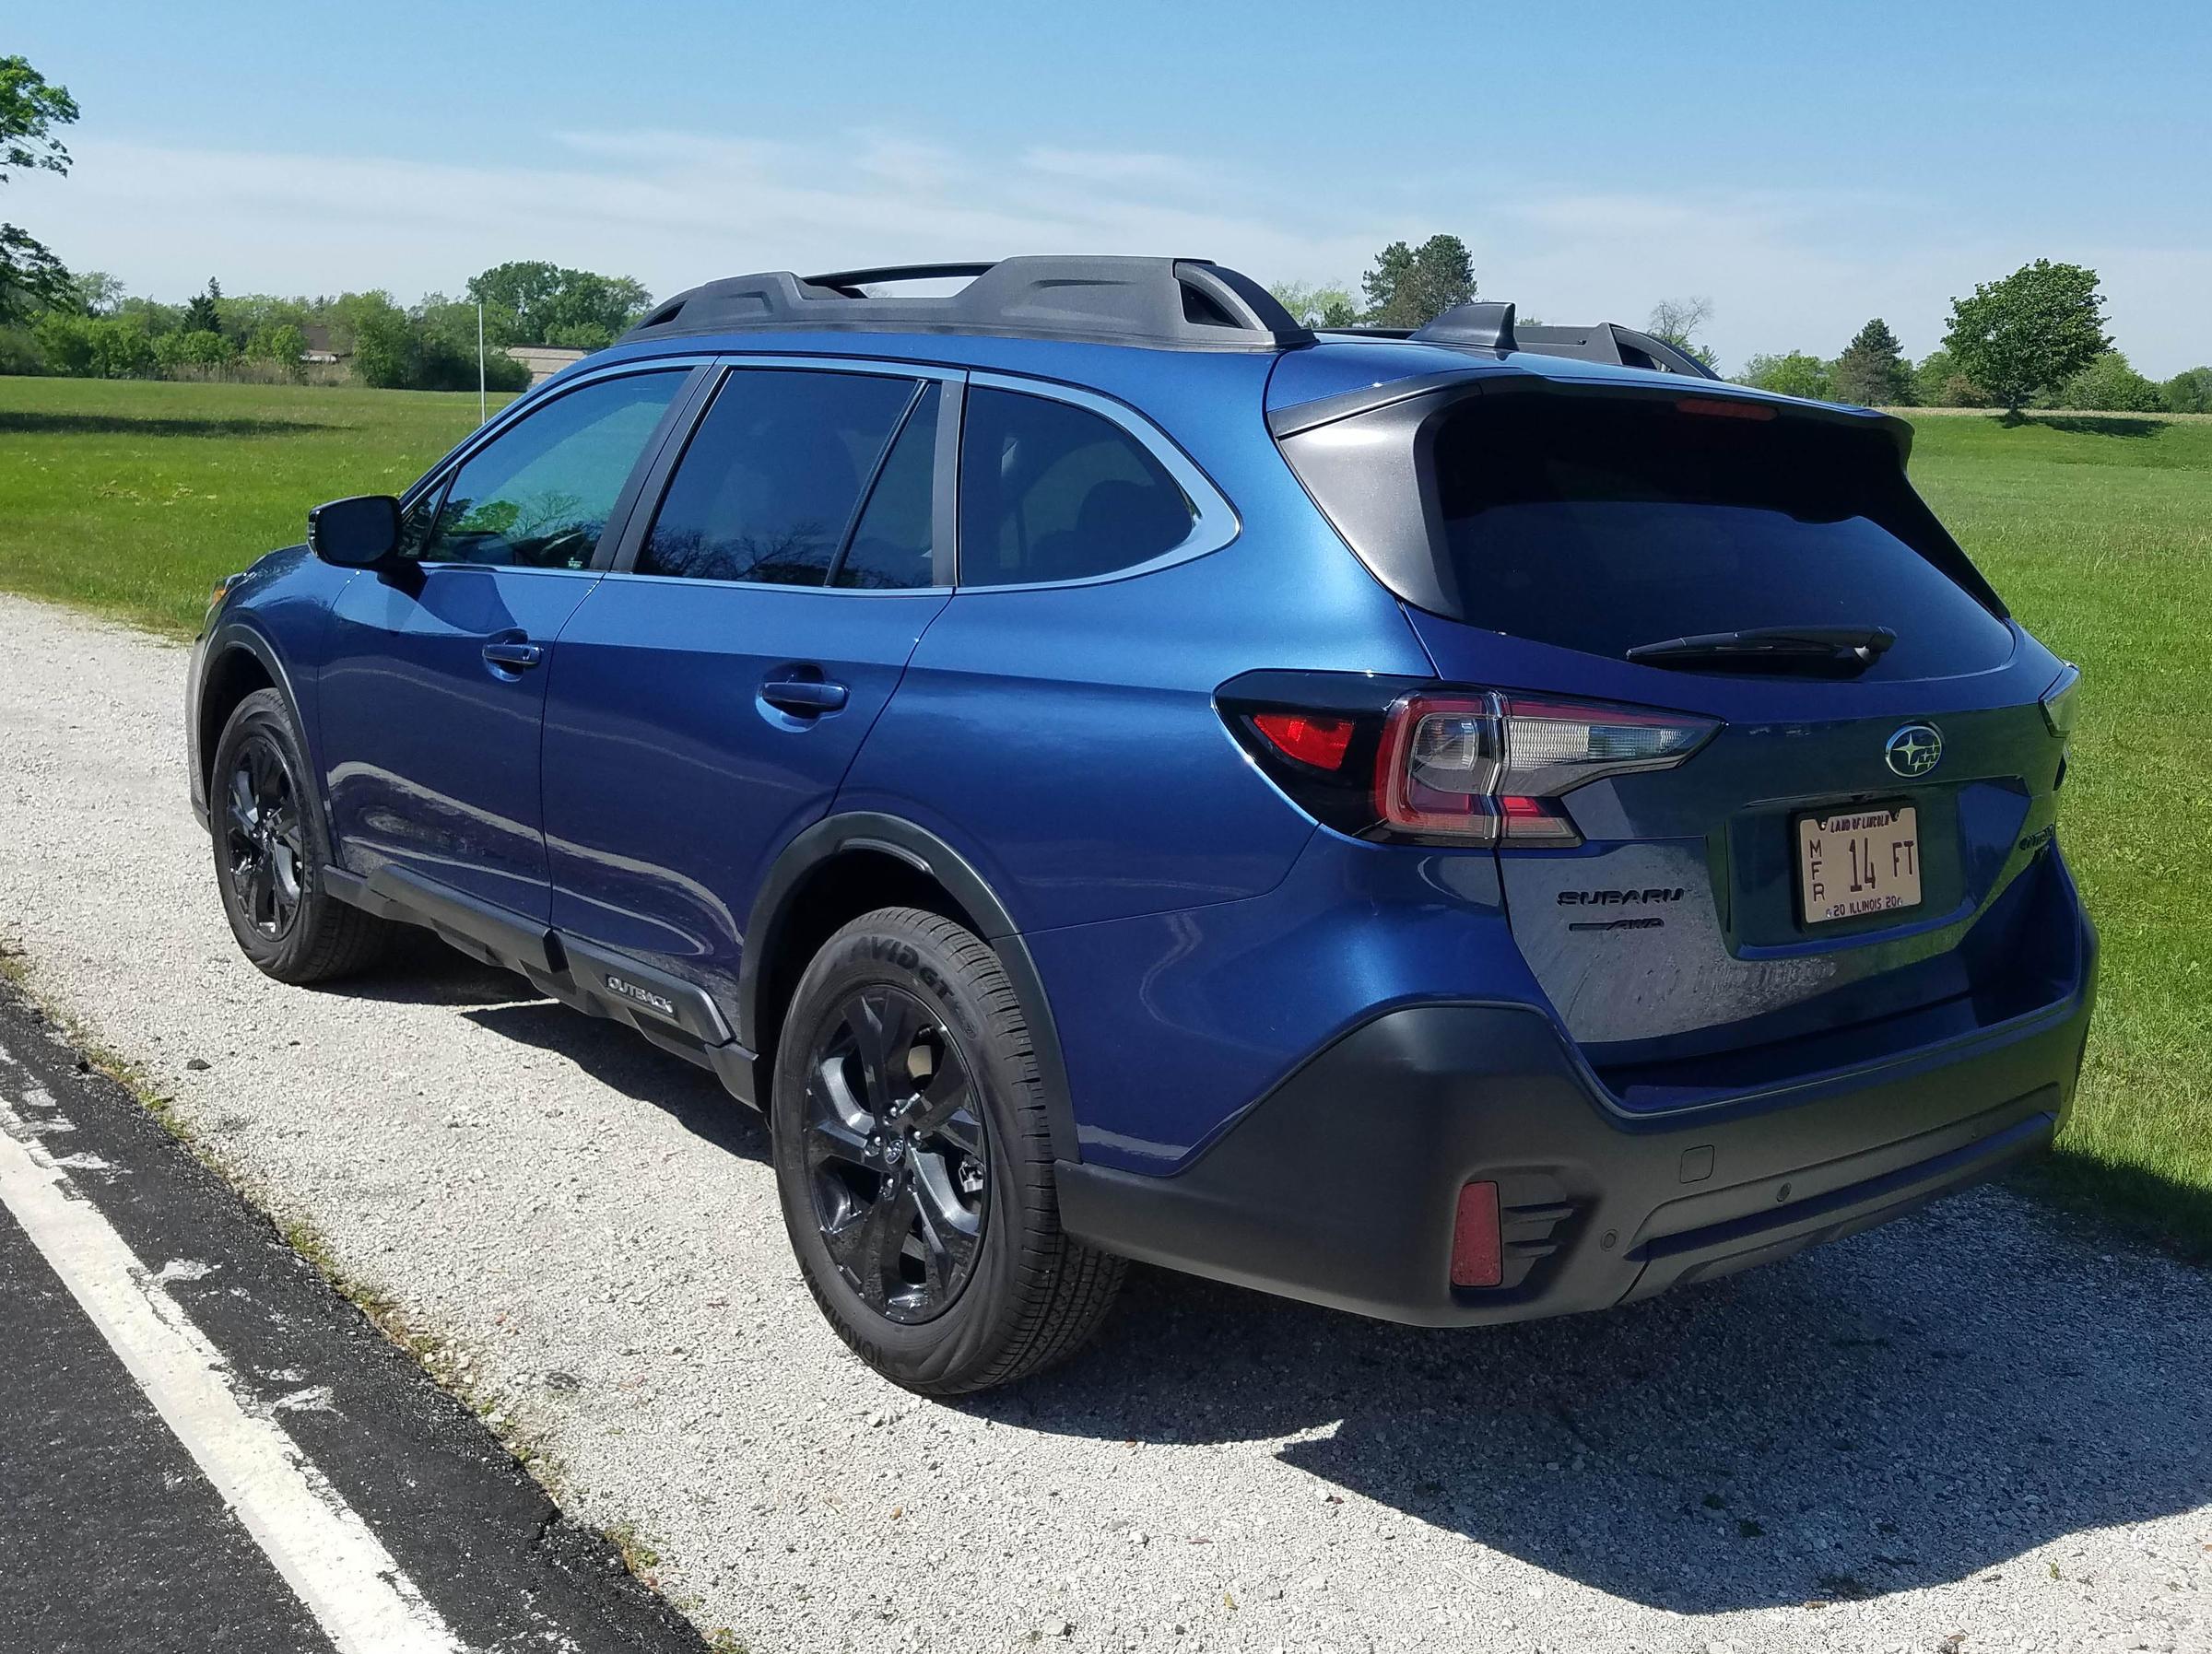 2020 Subaru Outback Onyx Edition Xt Review Wuwm